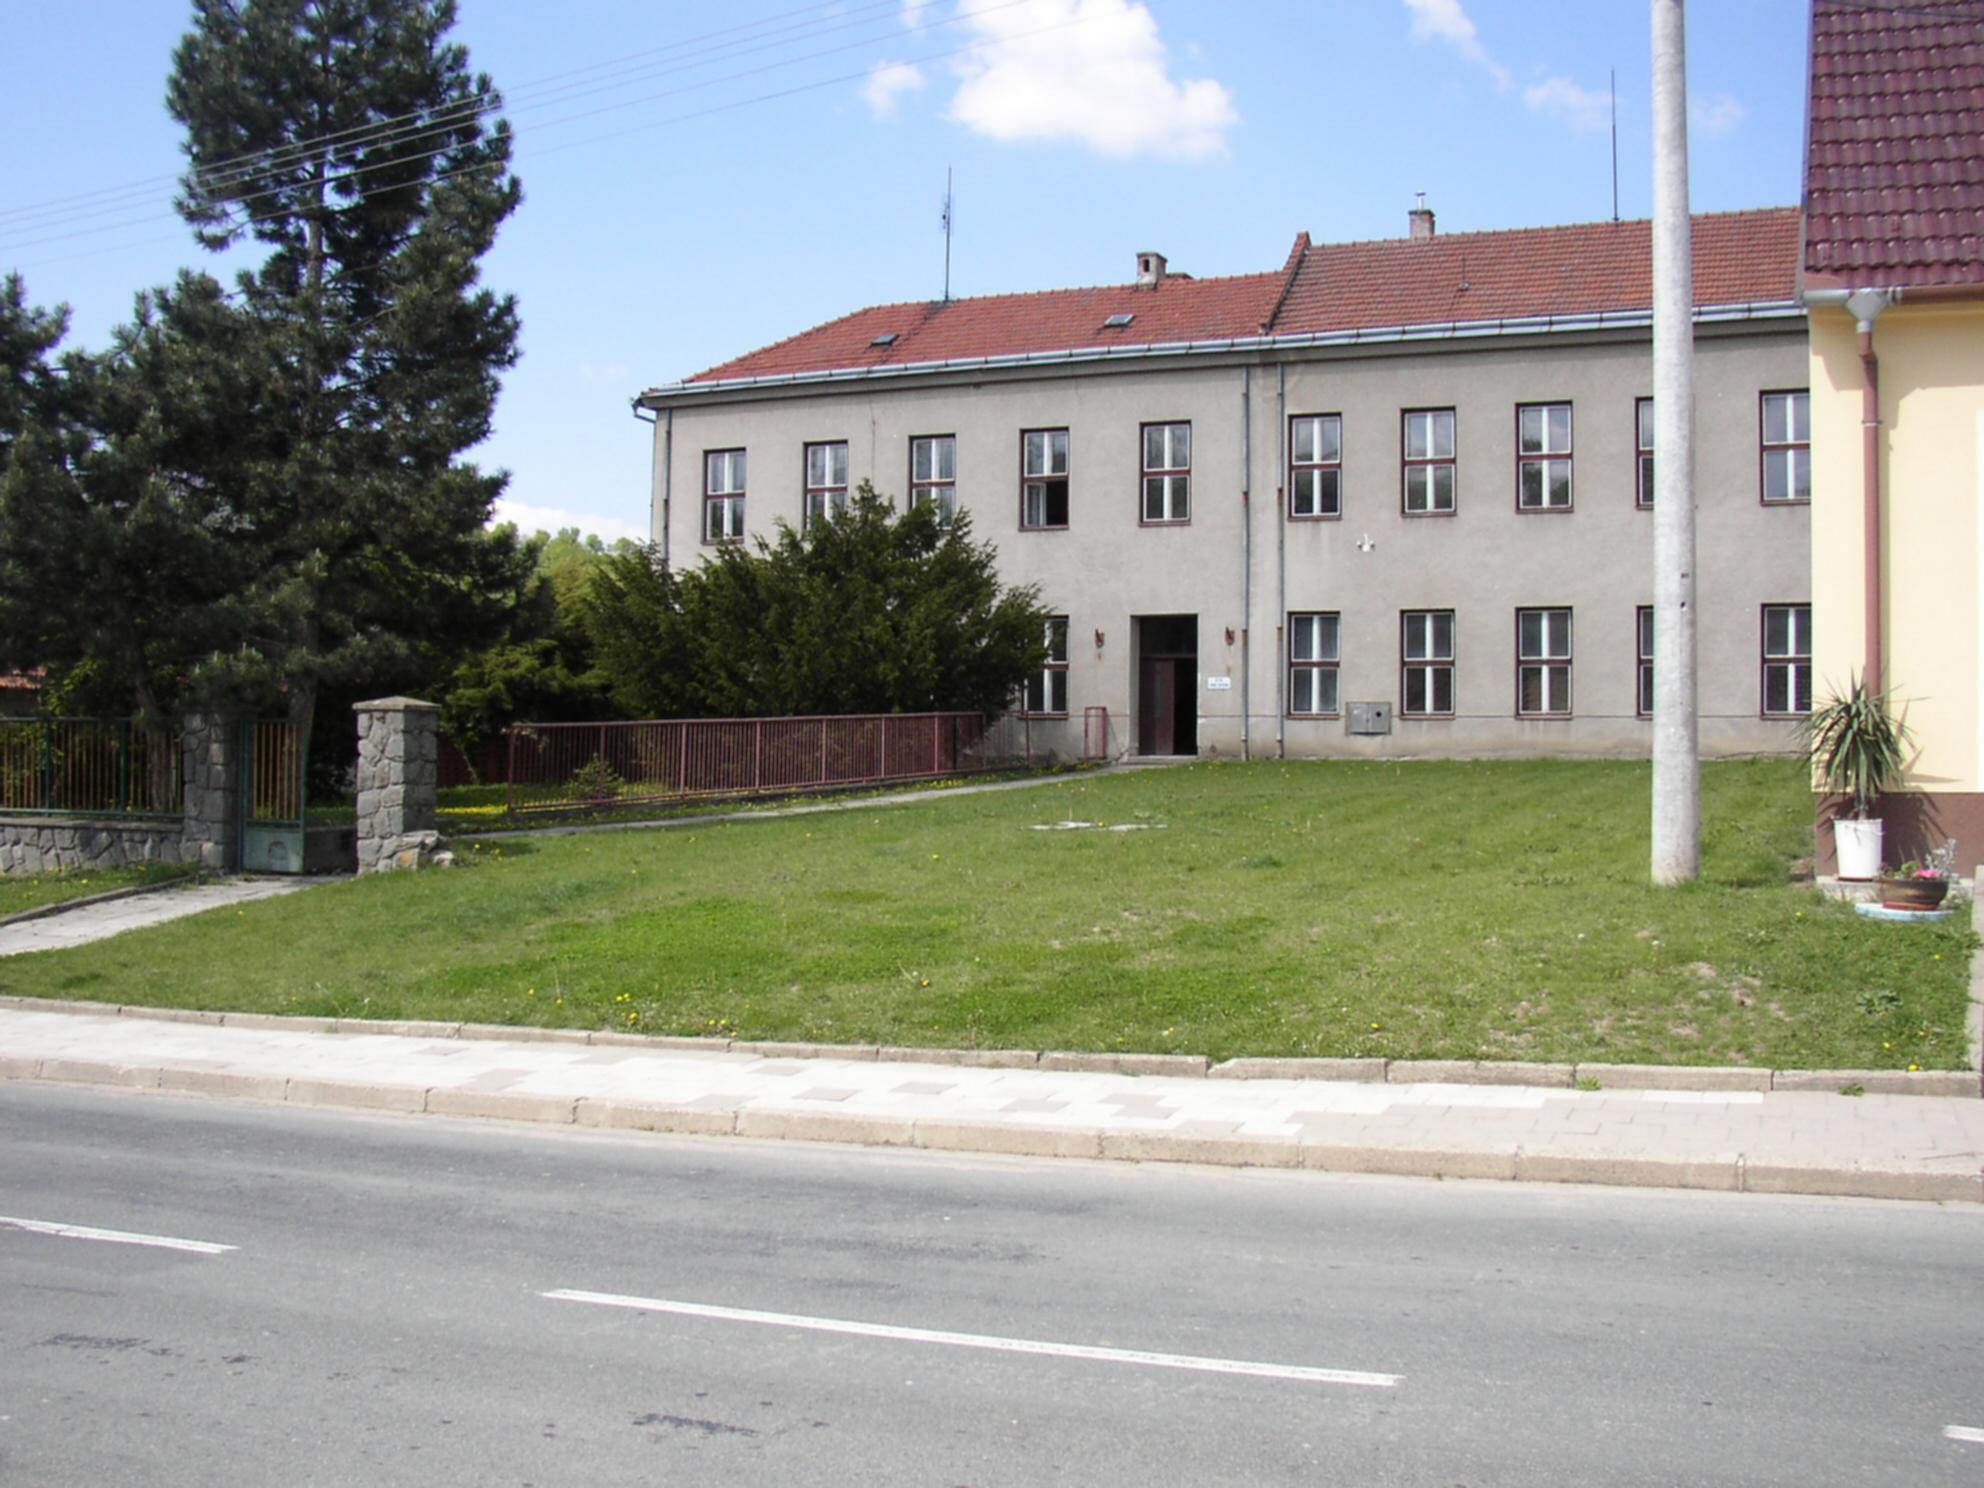 OBRÁZEK : horni_bojanovice_2006_budova_knihovny_kveten_-_2.jpg